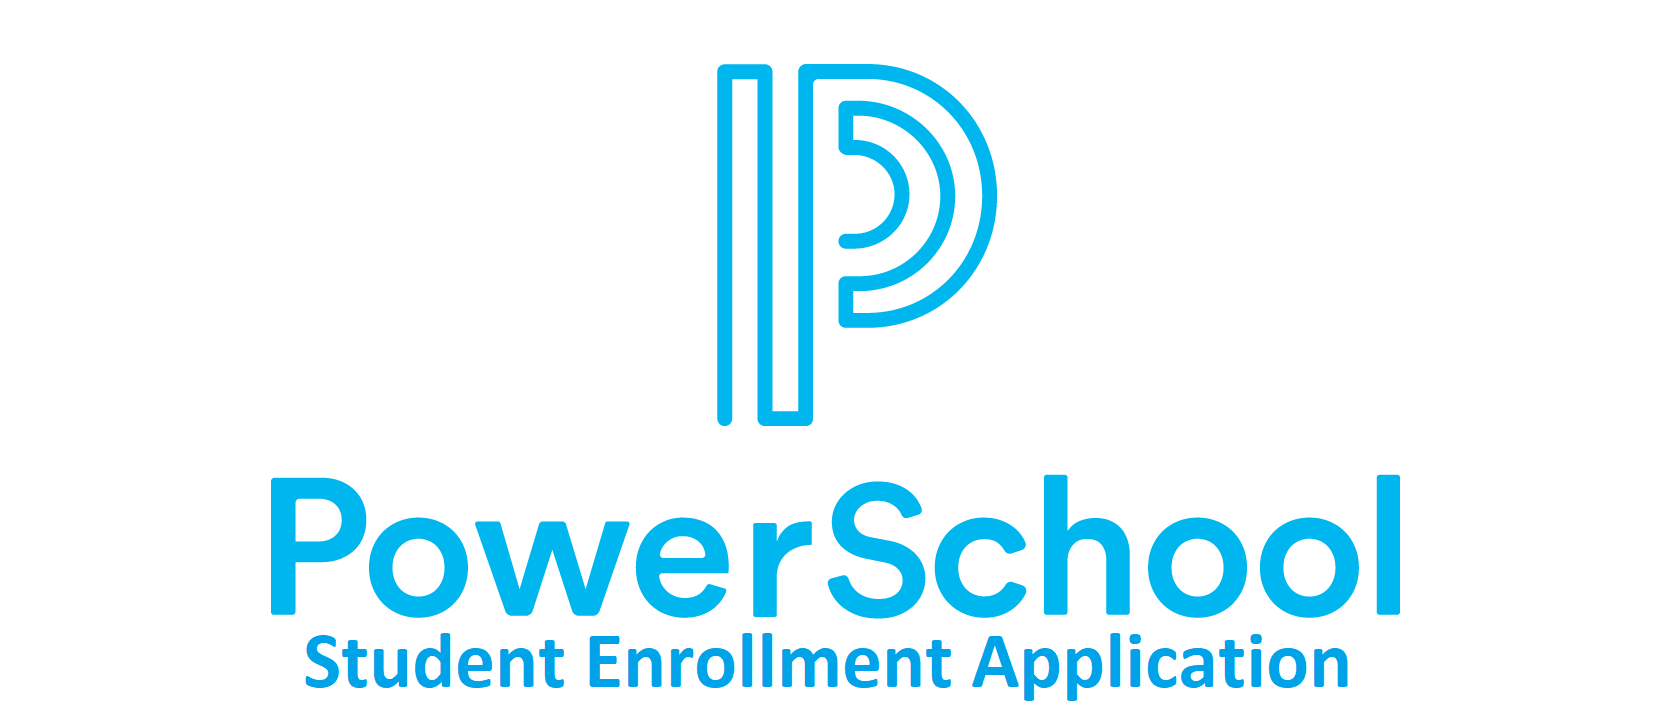 PowerSchool Student Enrollment Application